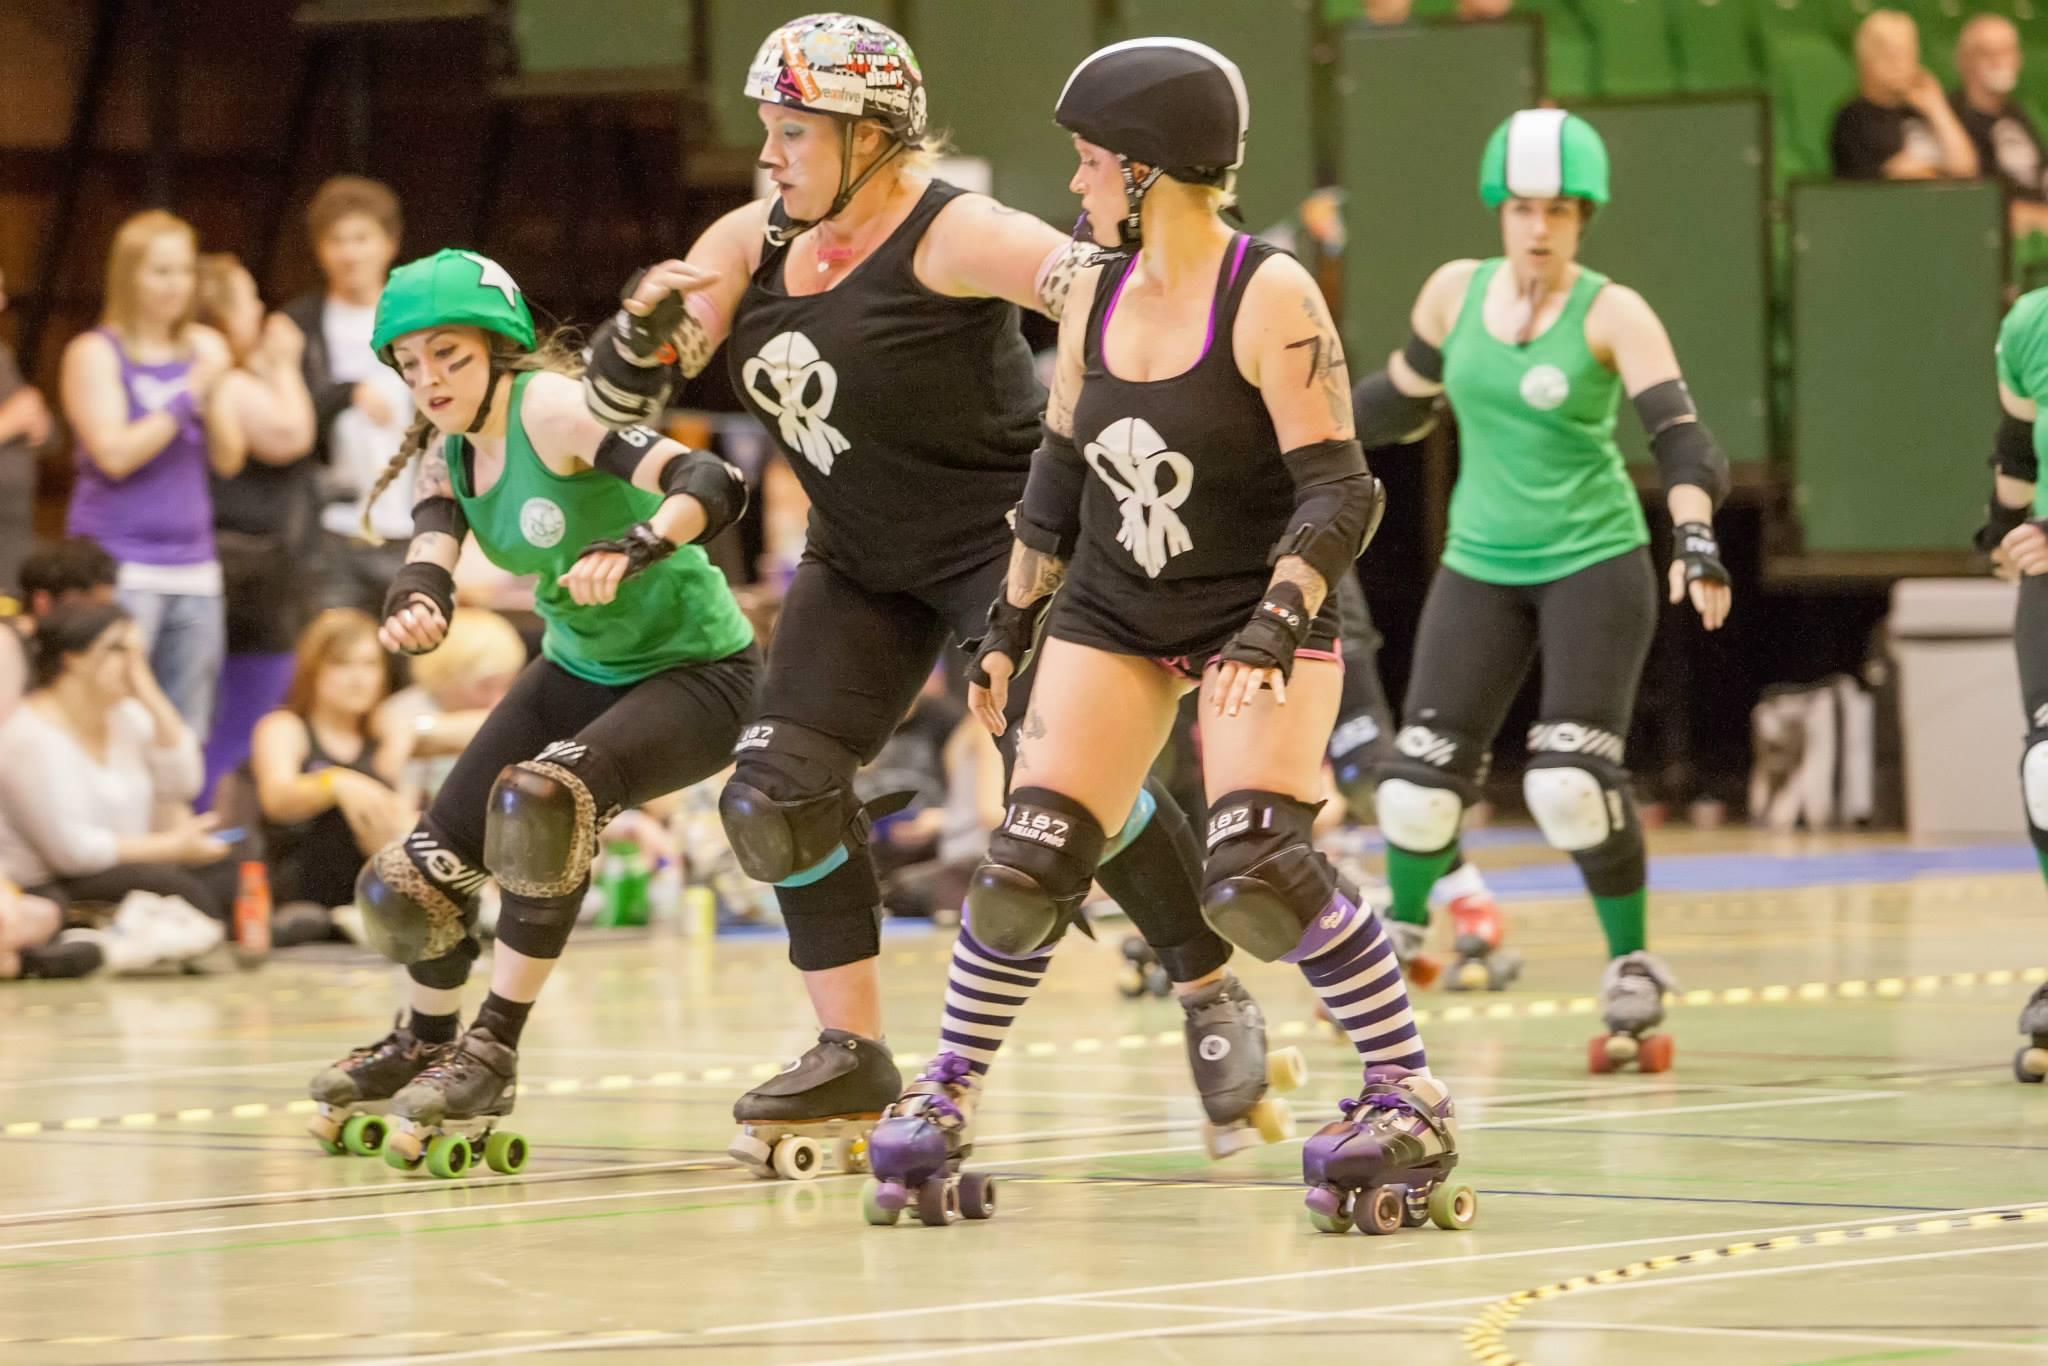 Jammer in roller derby | jammer homecoming warrior cast